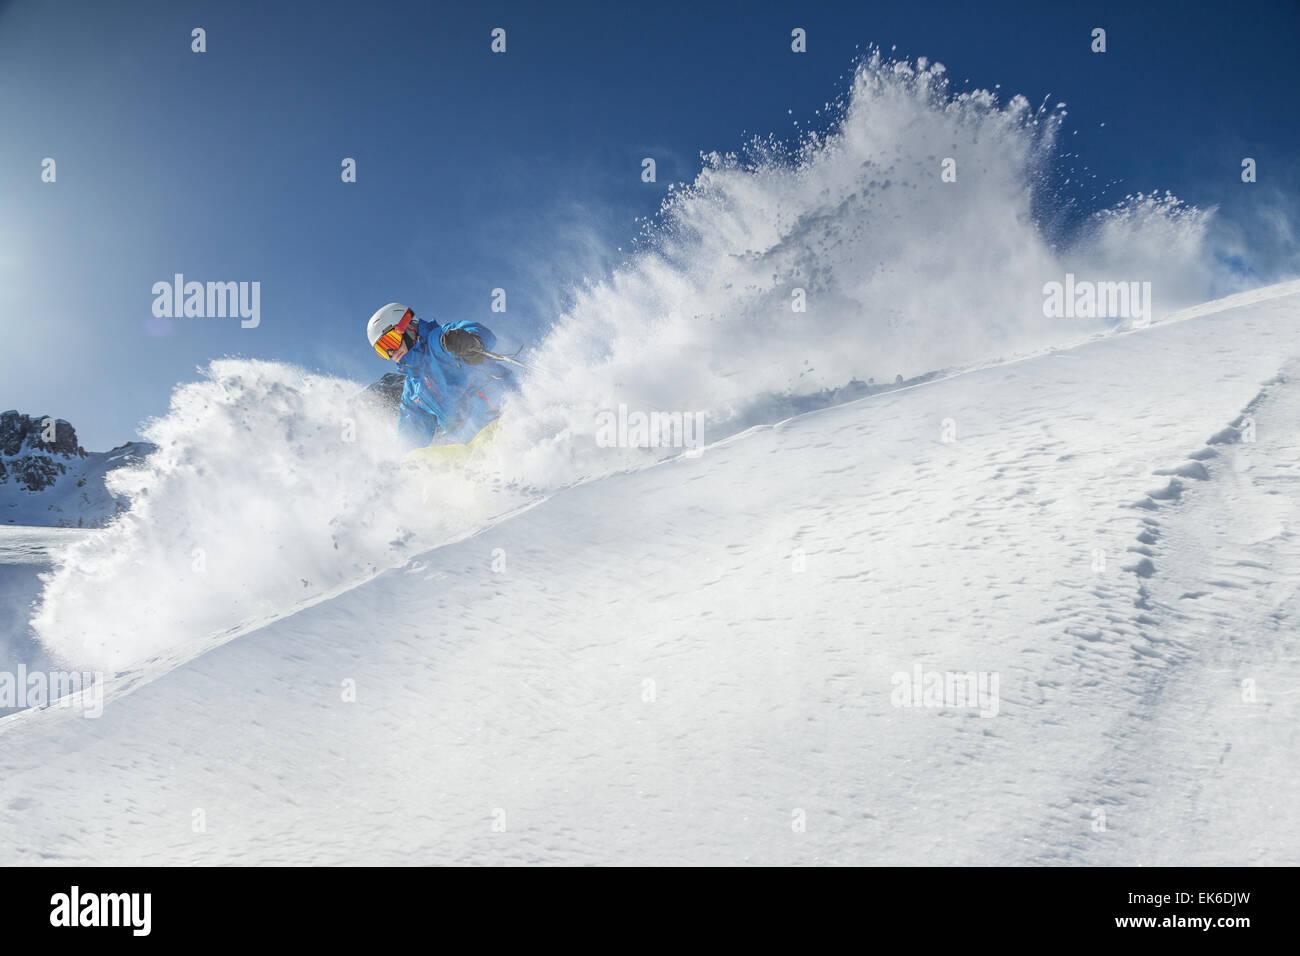 Skifahrer Abfahrt im Hochgebirge an sonnigen Tag. Stockbild